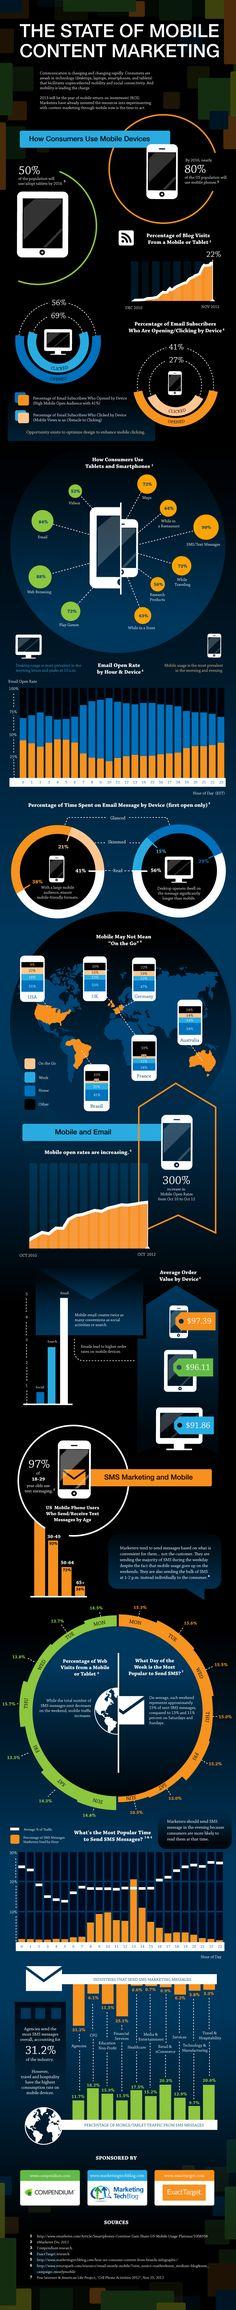 El estado del marketing de contenidos móvil #infografia #infographic #infografia